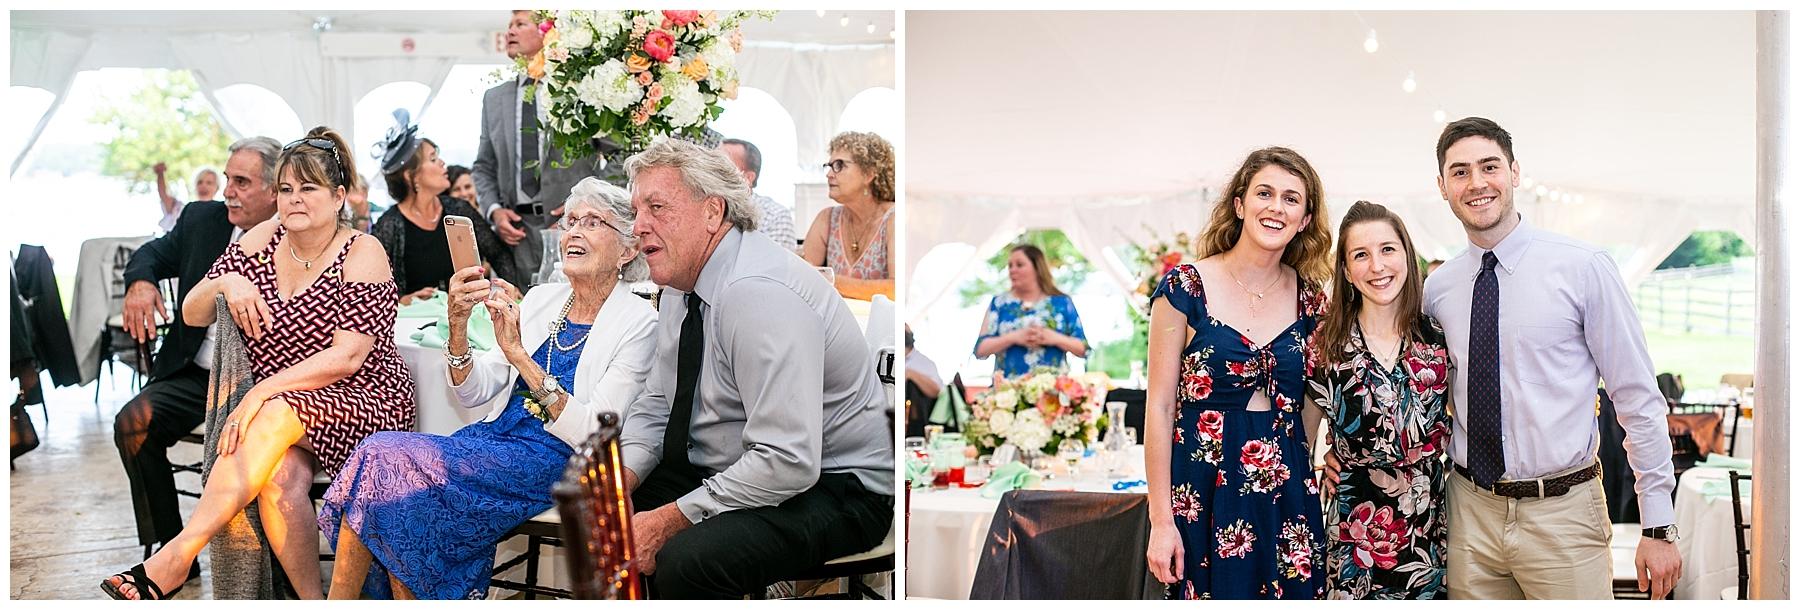 Chelsea Phil Bohemia River Overlook Wedding Living Radiant Photography photos_0186.jpg